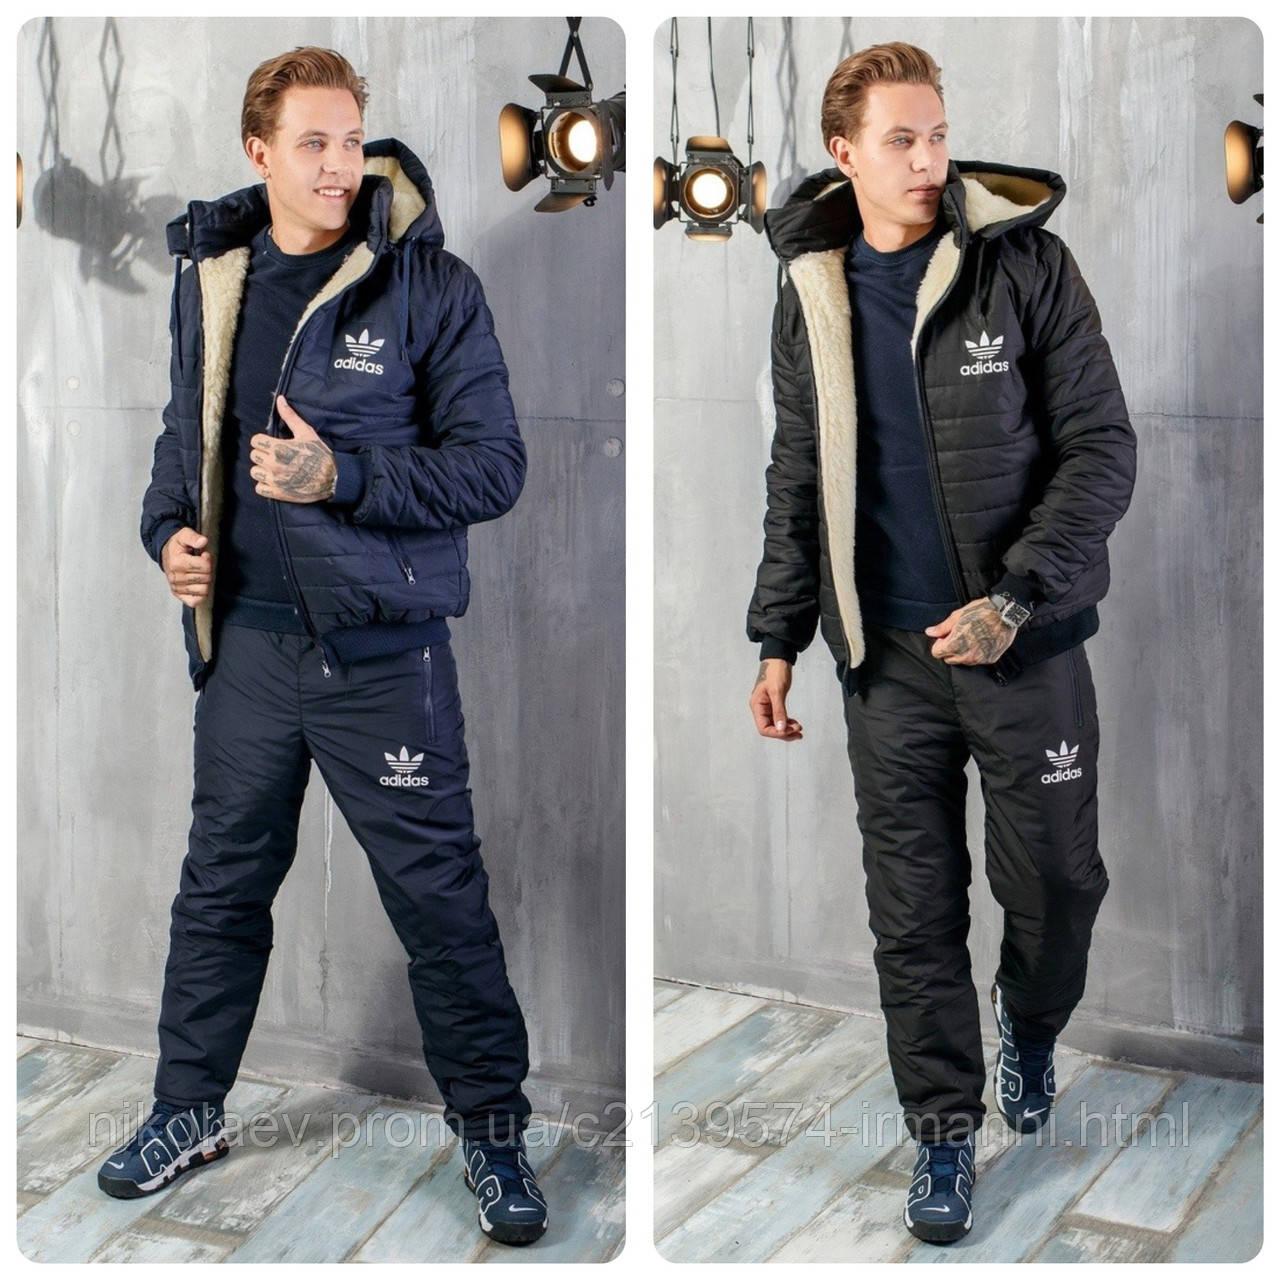 Зимний Мужской Спортивный Костюм Adidas - Адидас на овчине!